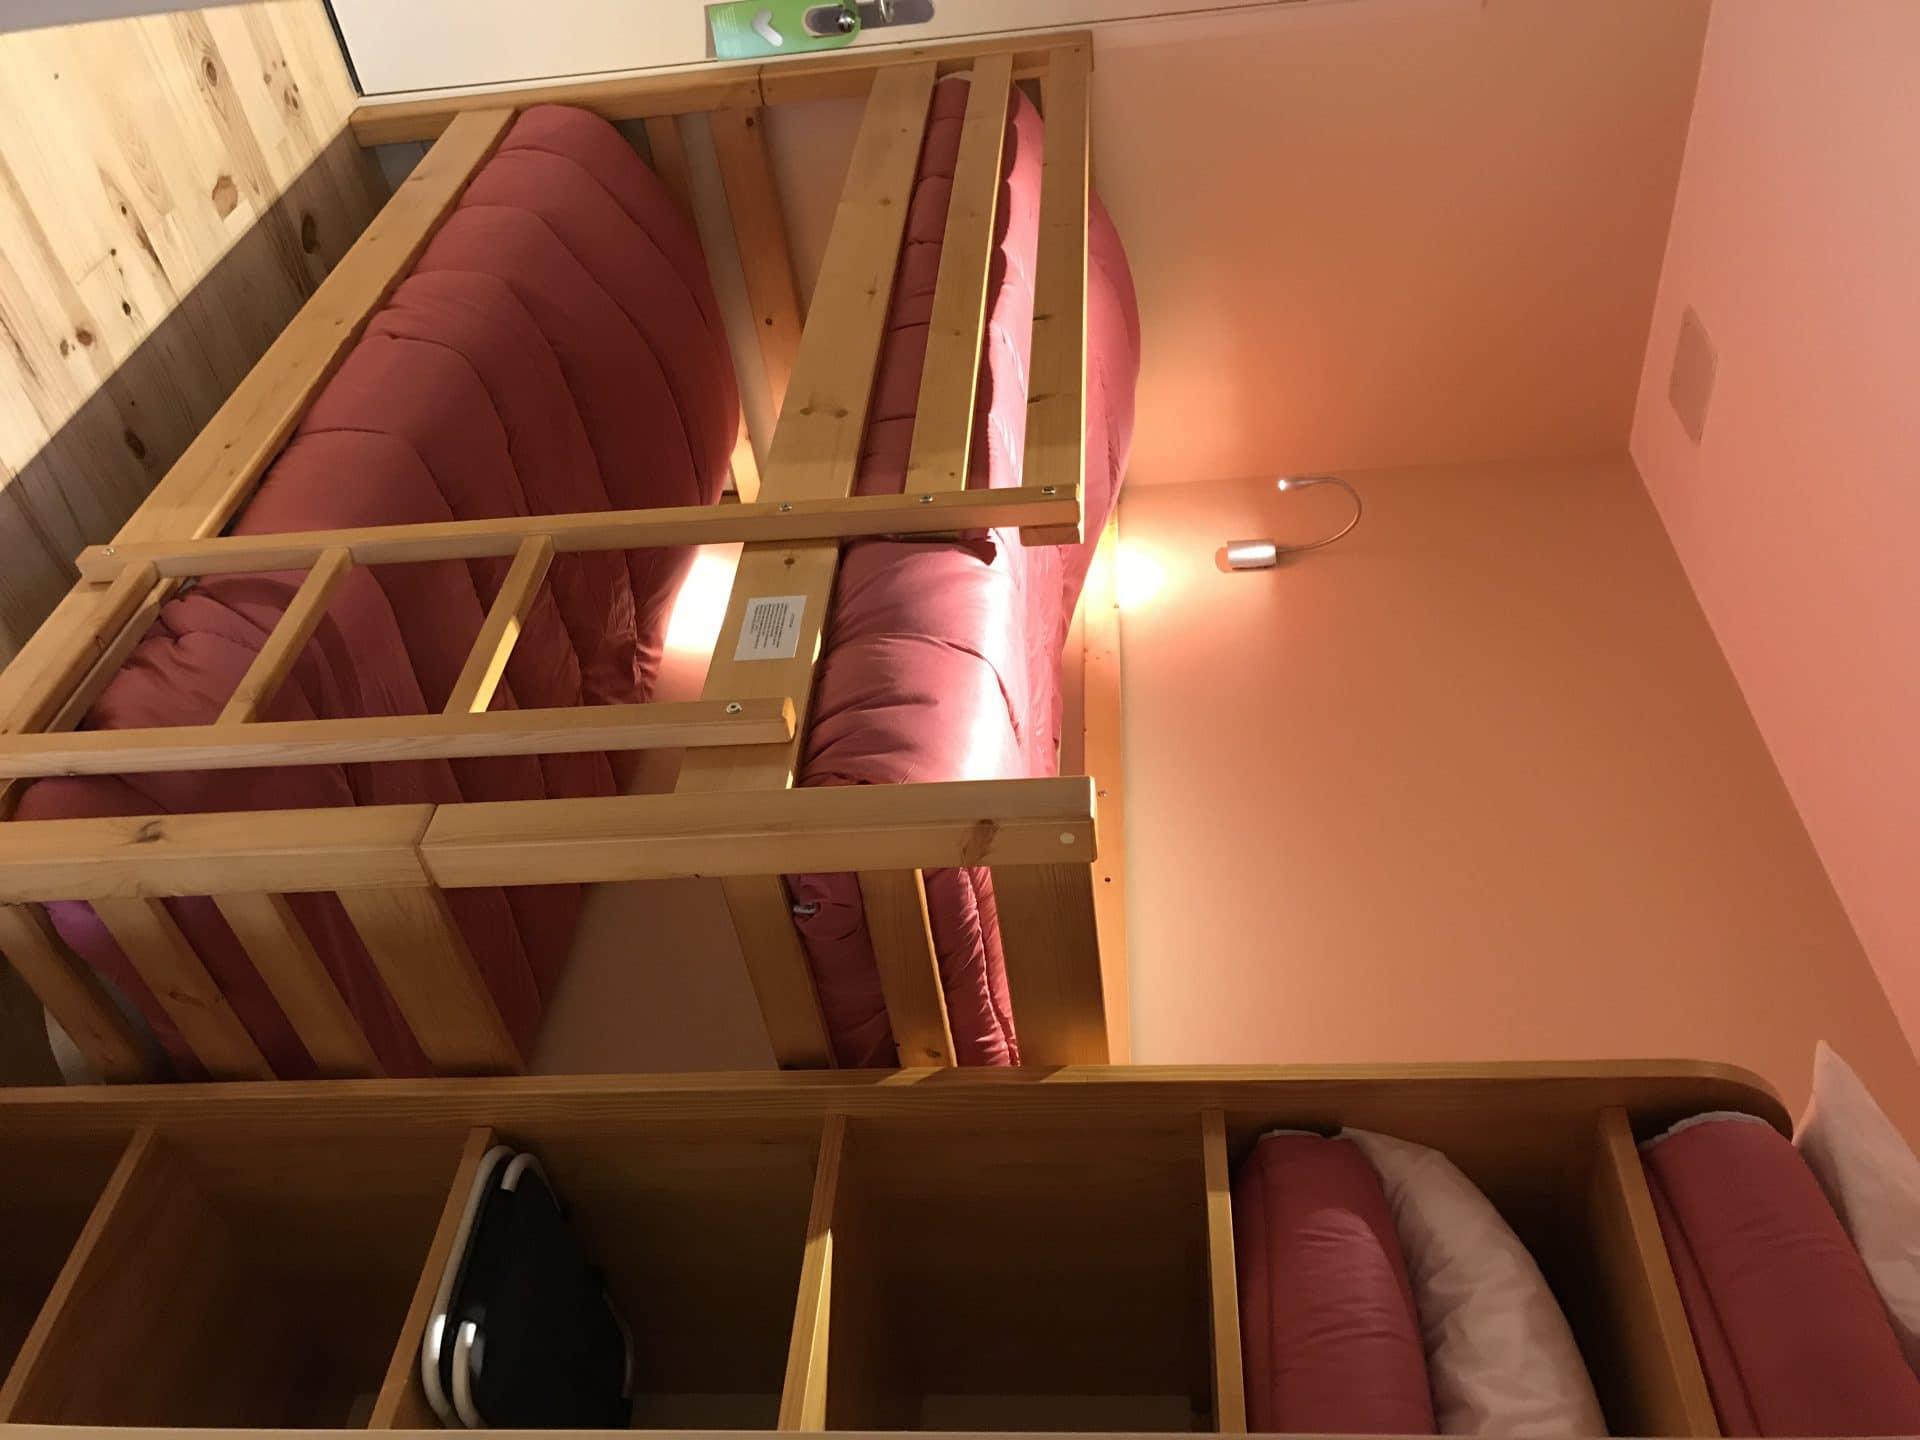 lit insolite lit insolite with lit insolite cheap crdit photo with lit insolite cabanes du. Black Bedroom Furniture Sets. Home Design Ideas